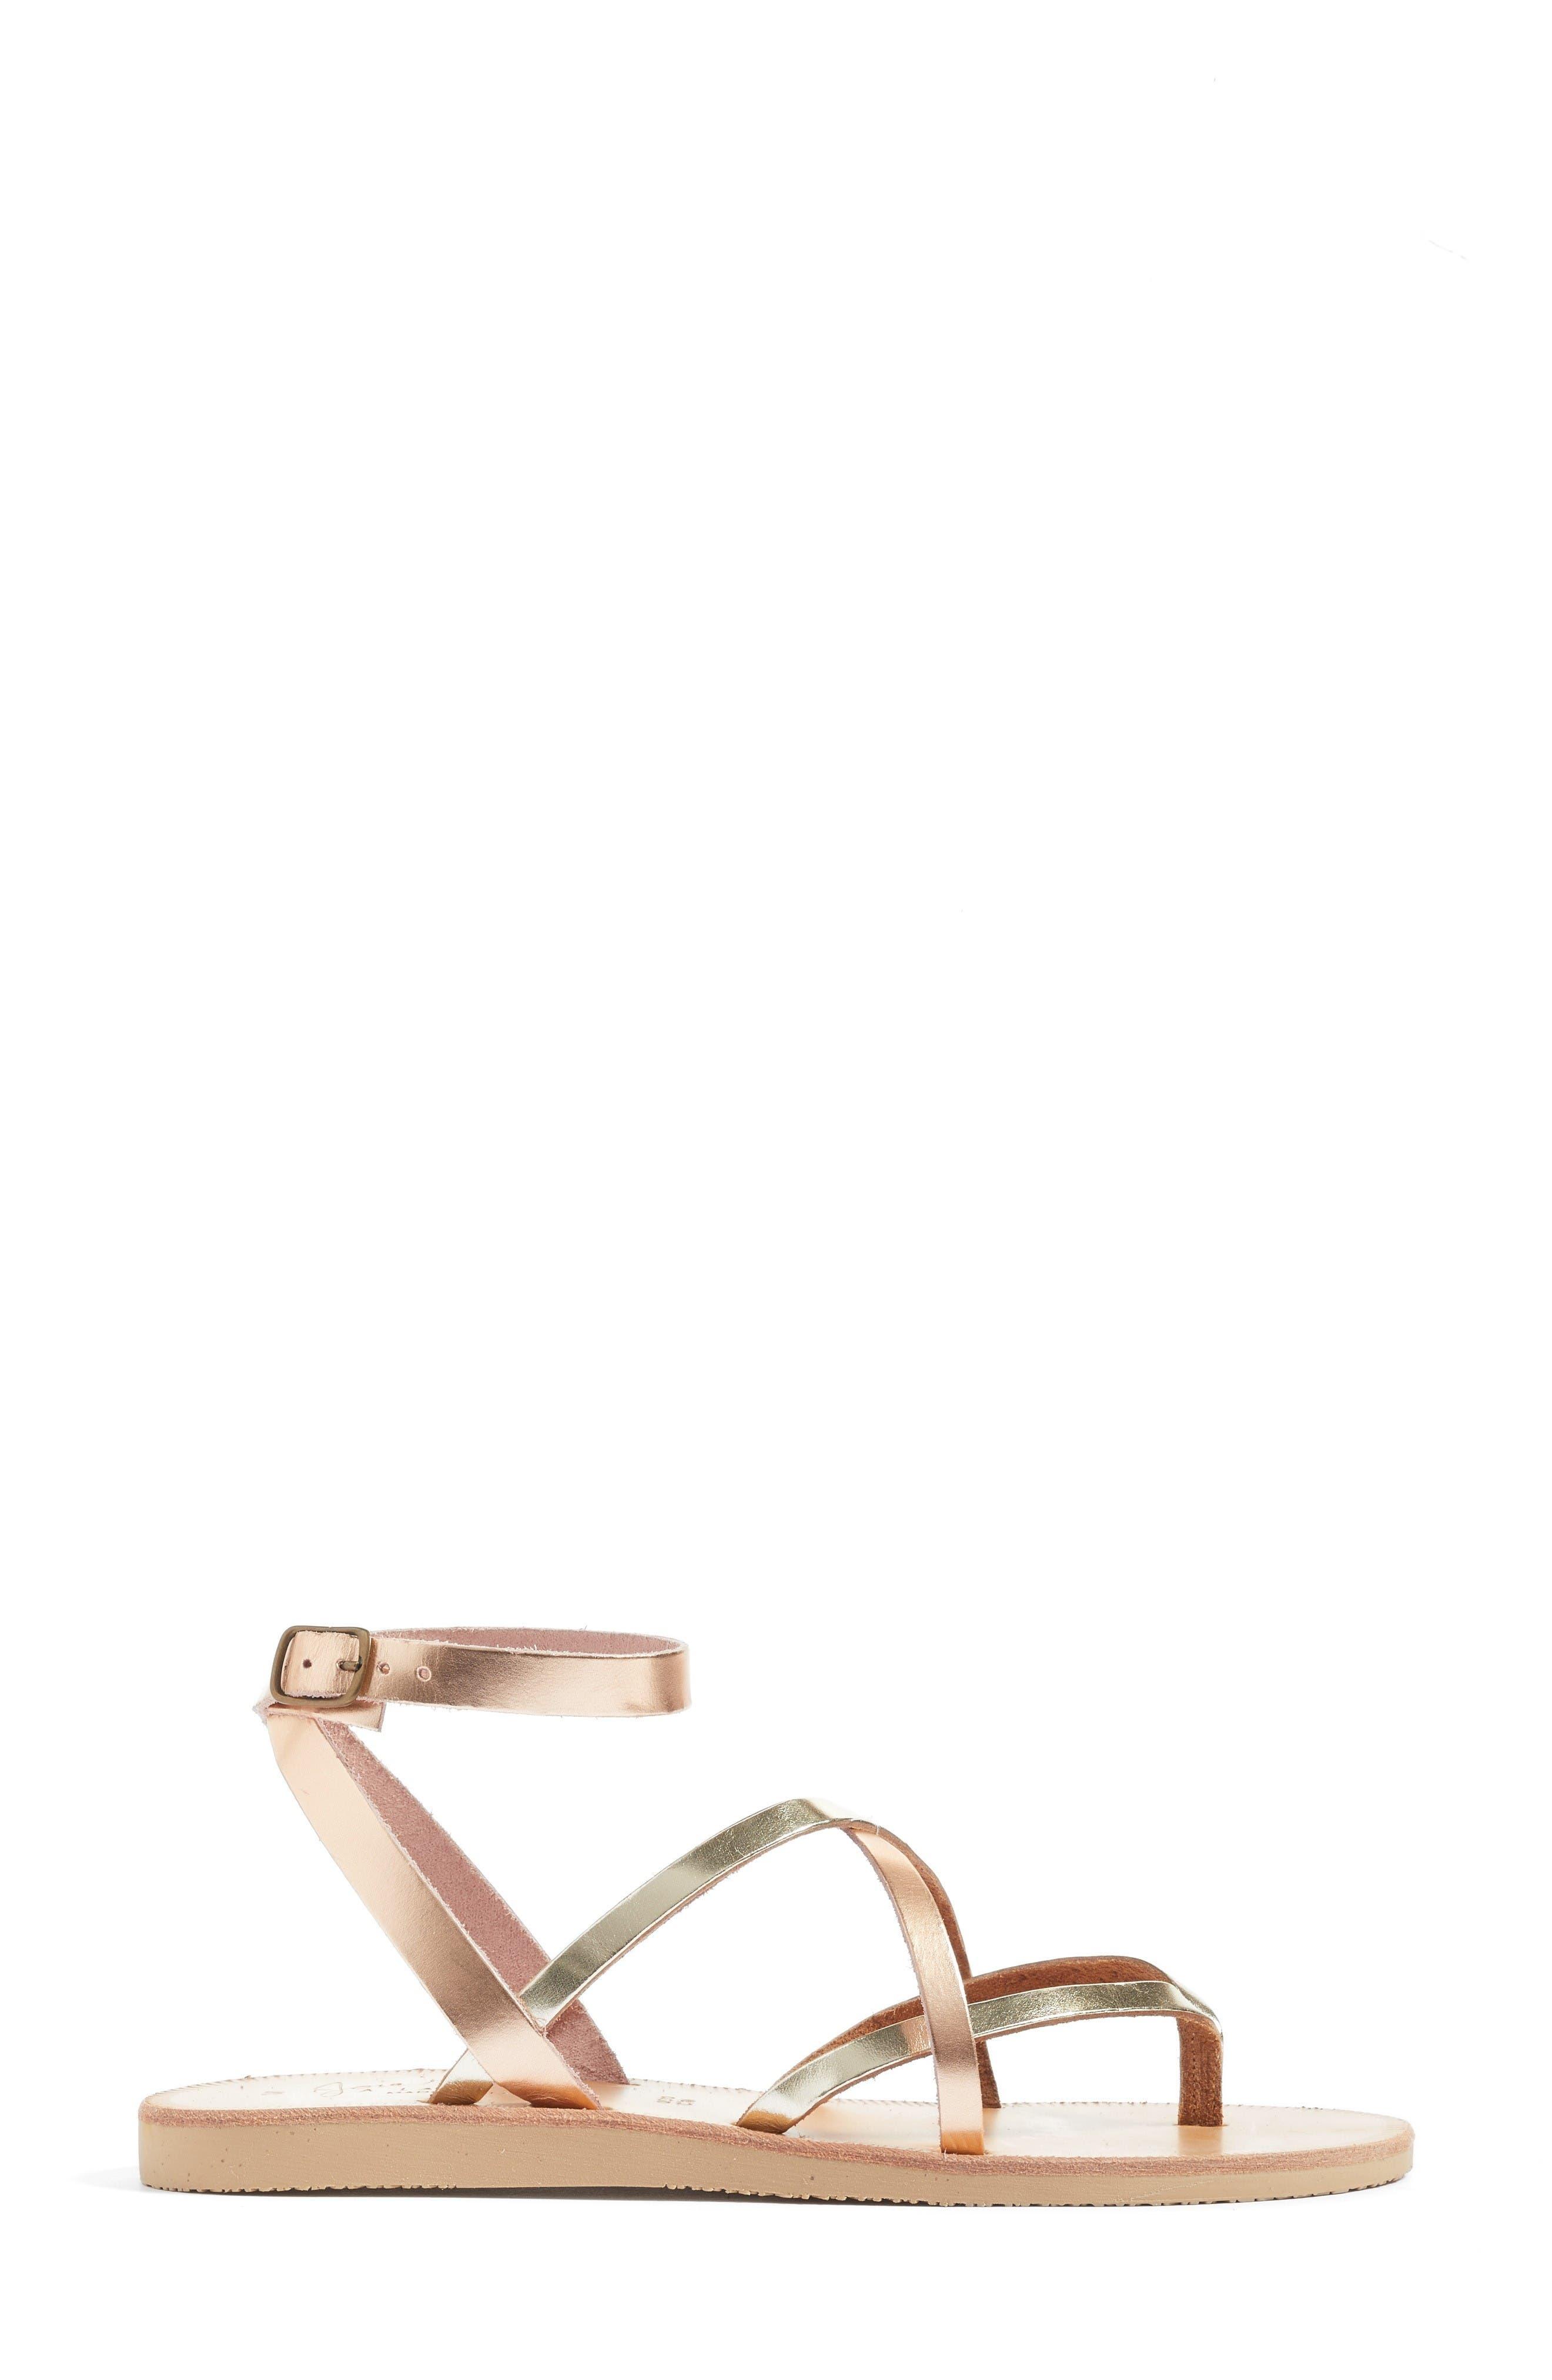 Alternate Image 3  - Joie 'Oda' Flat Sandal (Women)